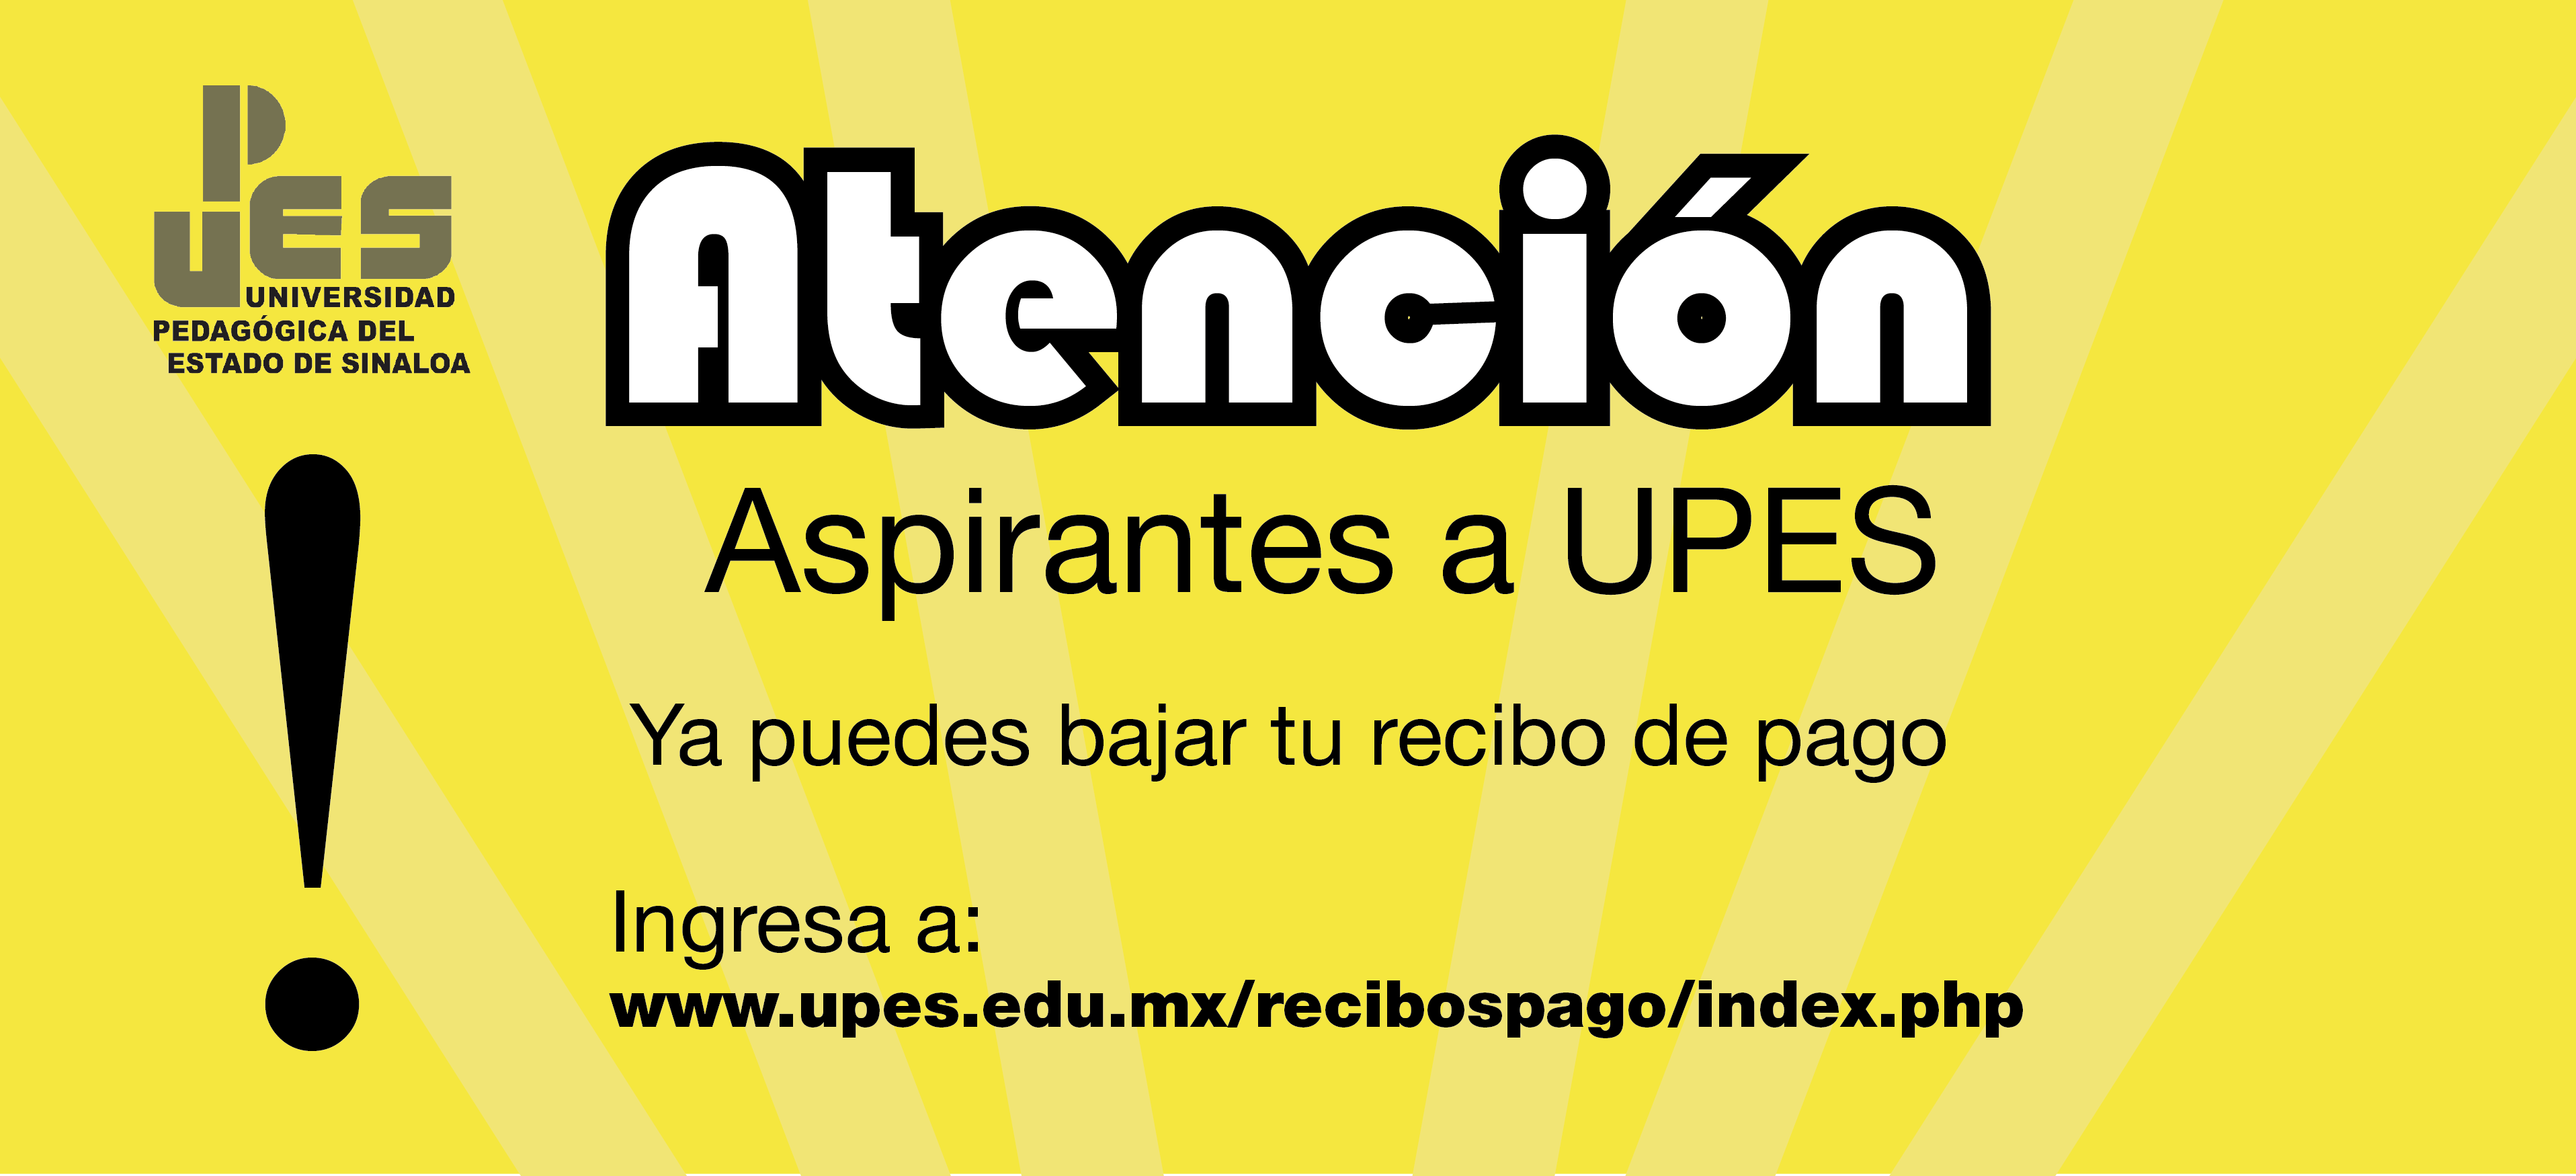 aviso-recibo-upes-slider-02